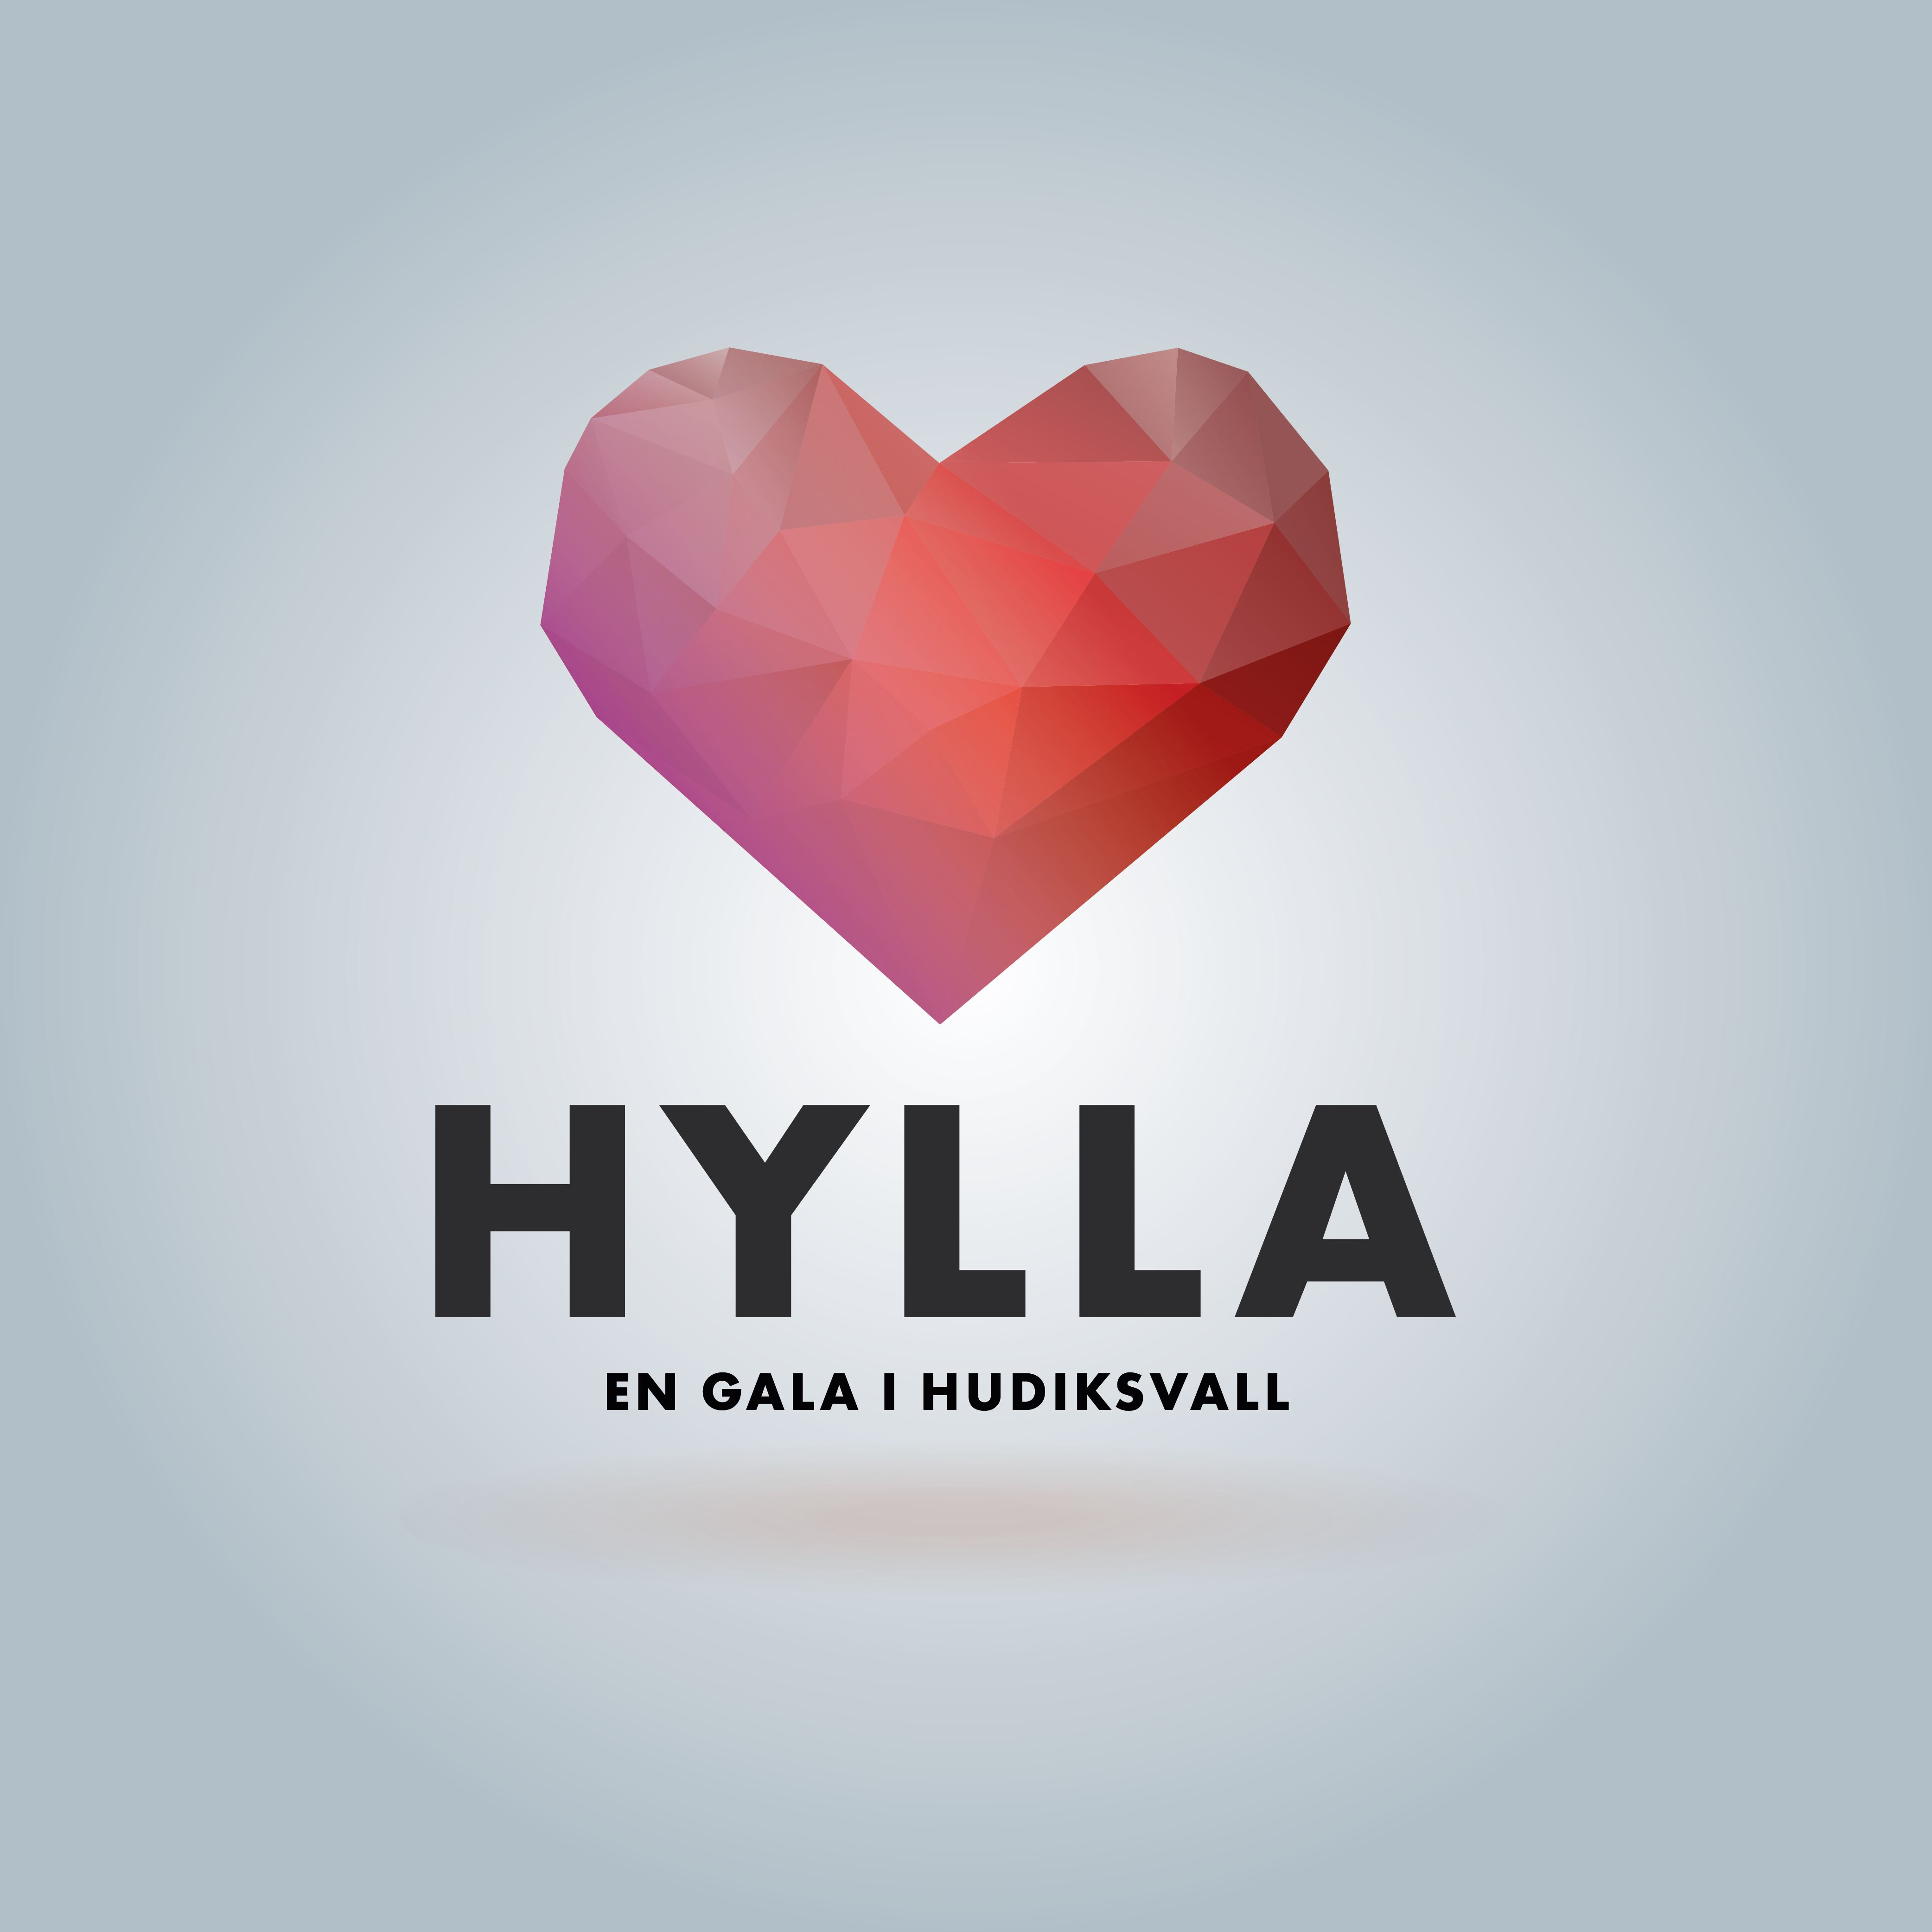 HYLLA HUDIK - vårens största gala.